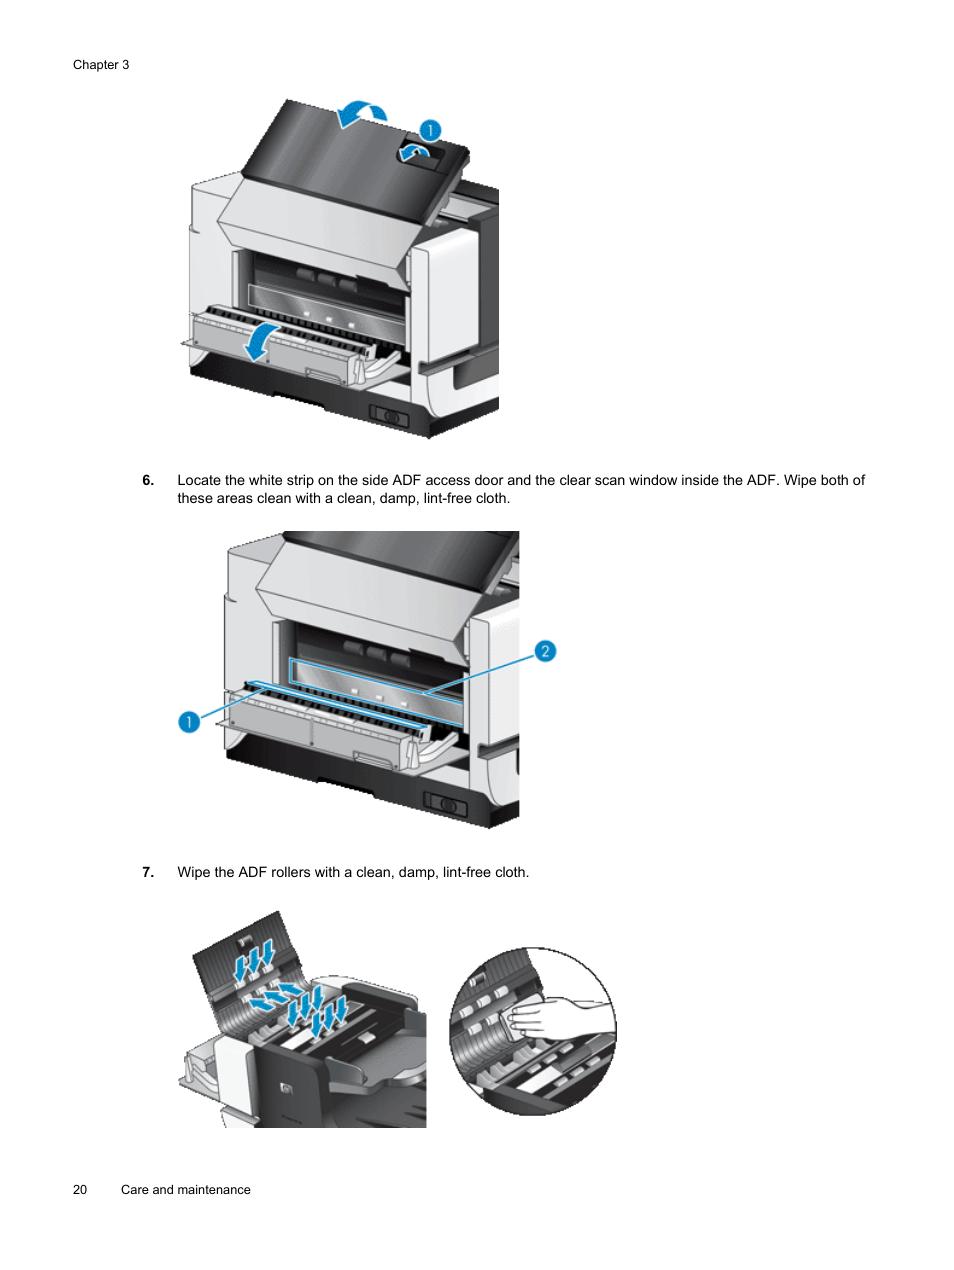 hp n9120 manual product user guide instruction u2022 rh testdpc co HP Scanjet N9120 Specs HP Scanjet N9120 Specifications